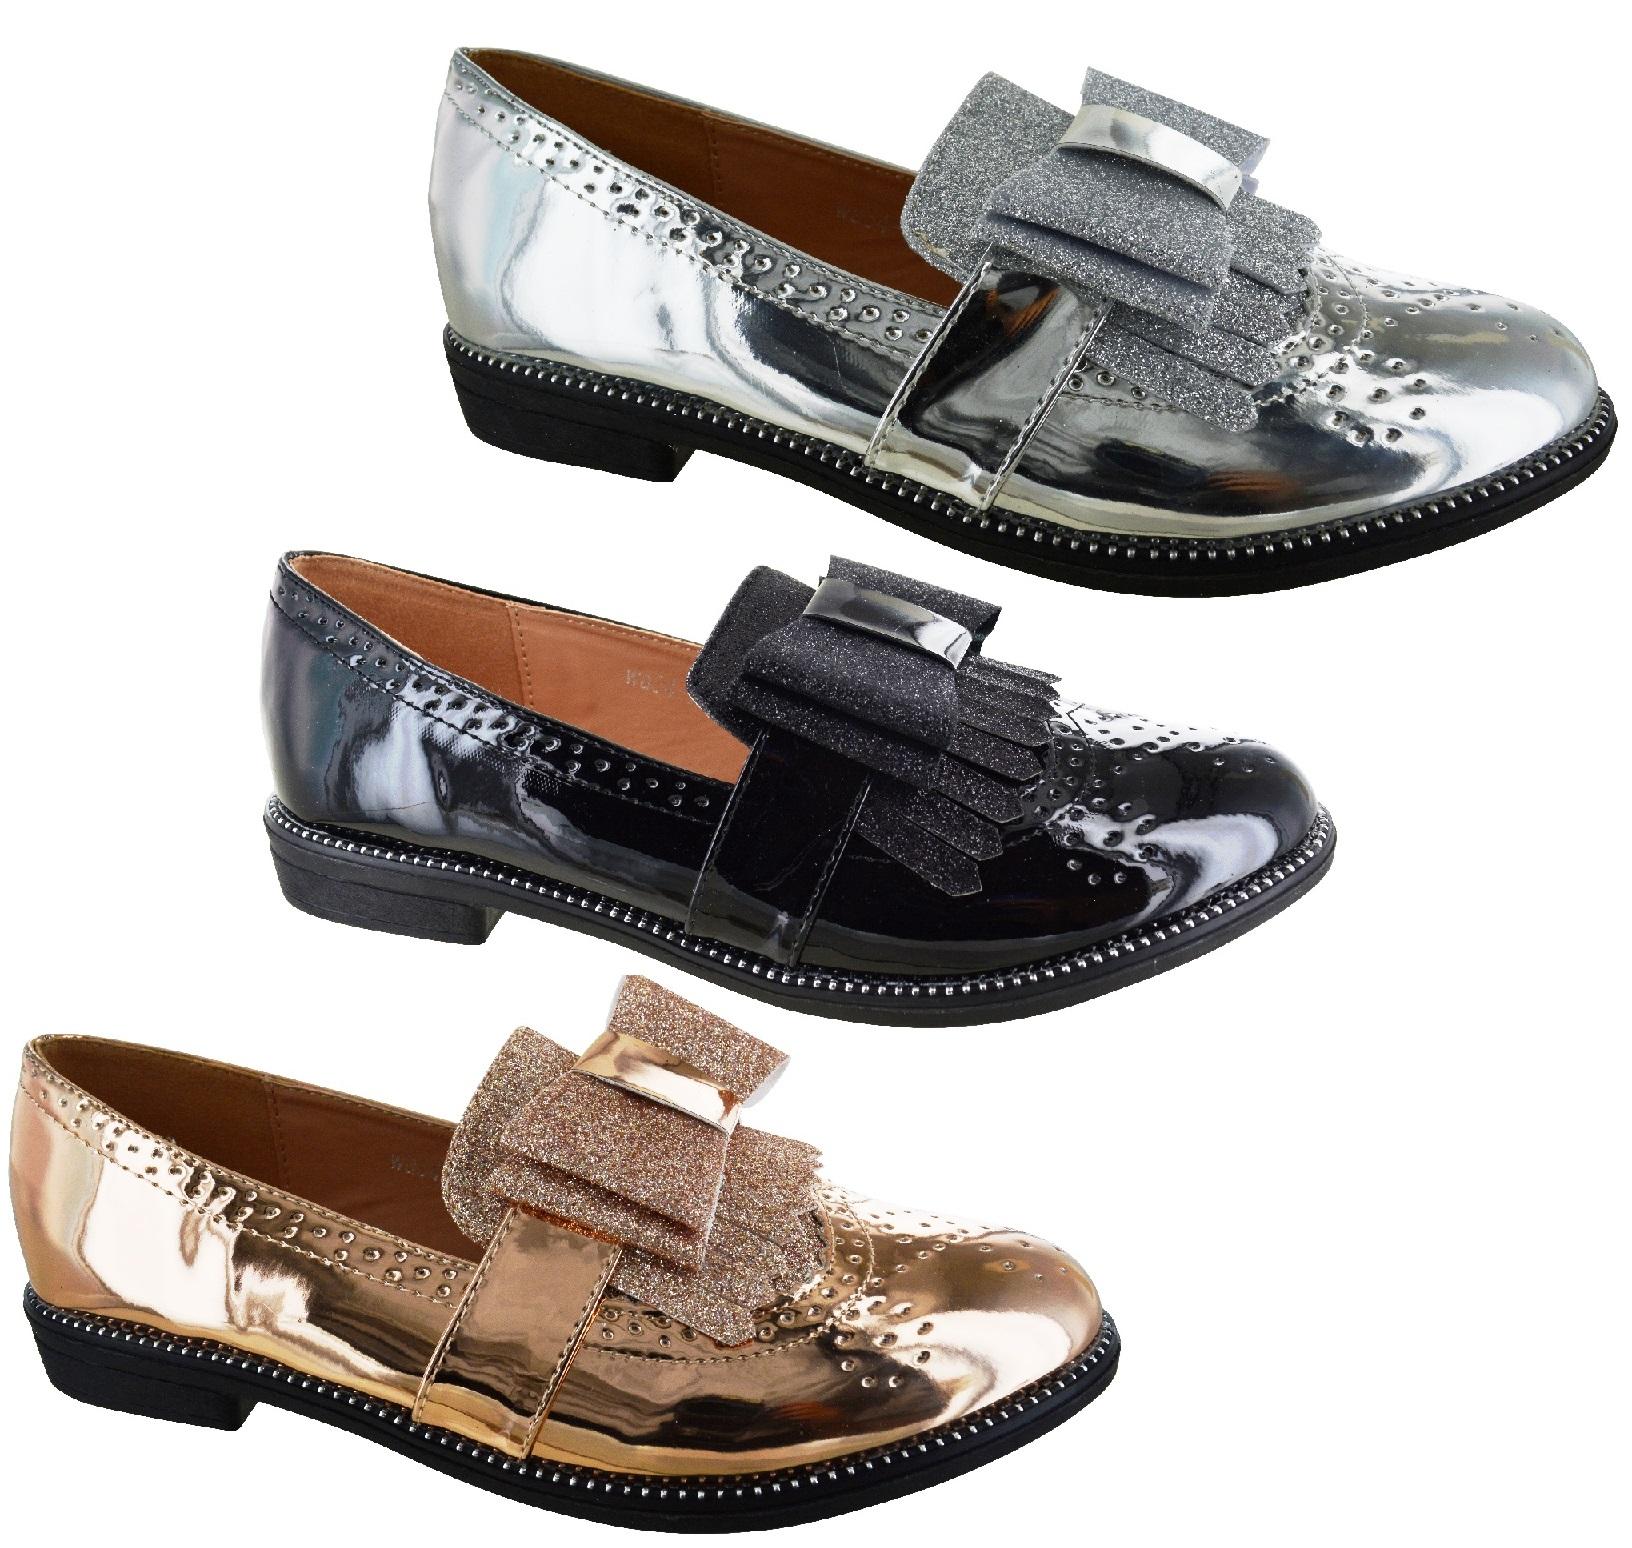 Detalles de Mujer Charol Brillante Lazo Elegante Casual Oficina Plano Zapatos Oxford Talla